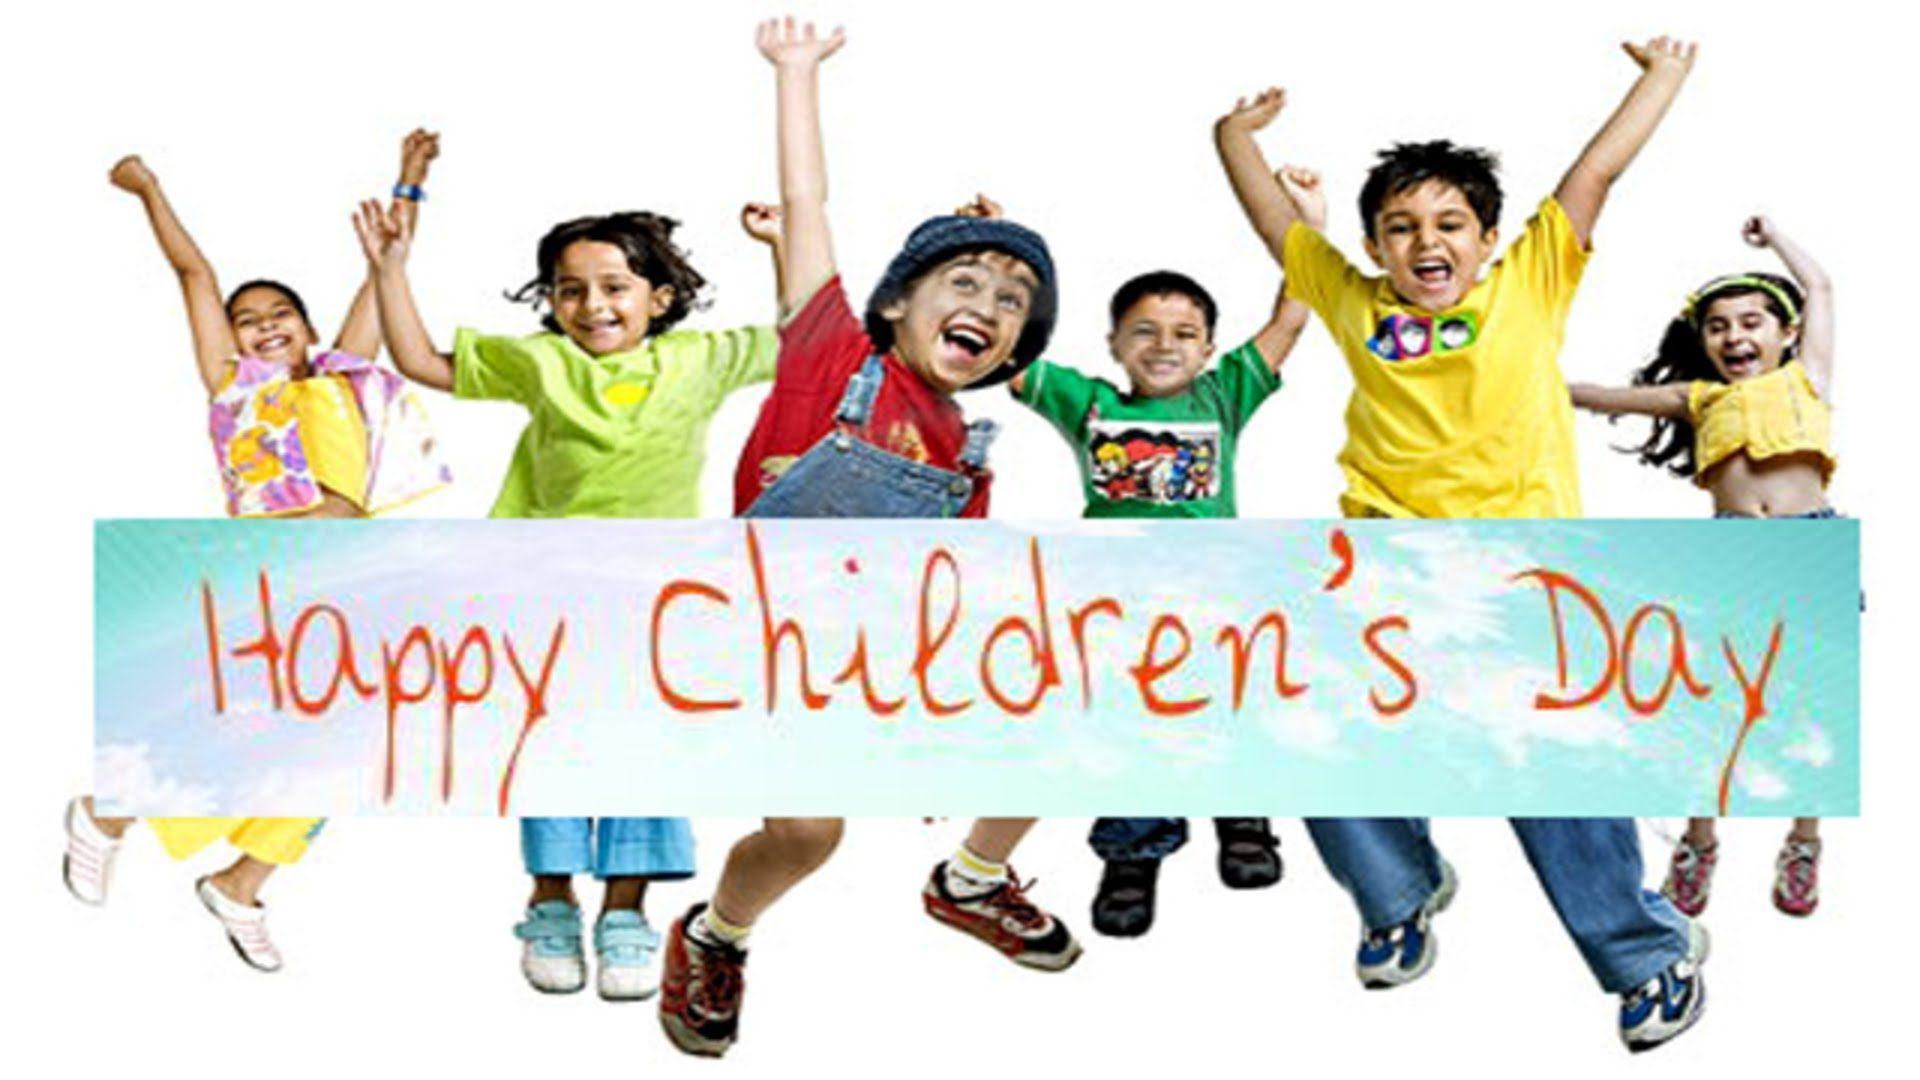 childrenday speech